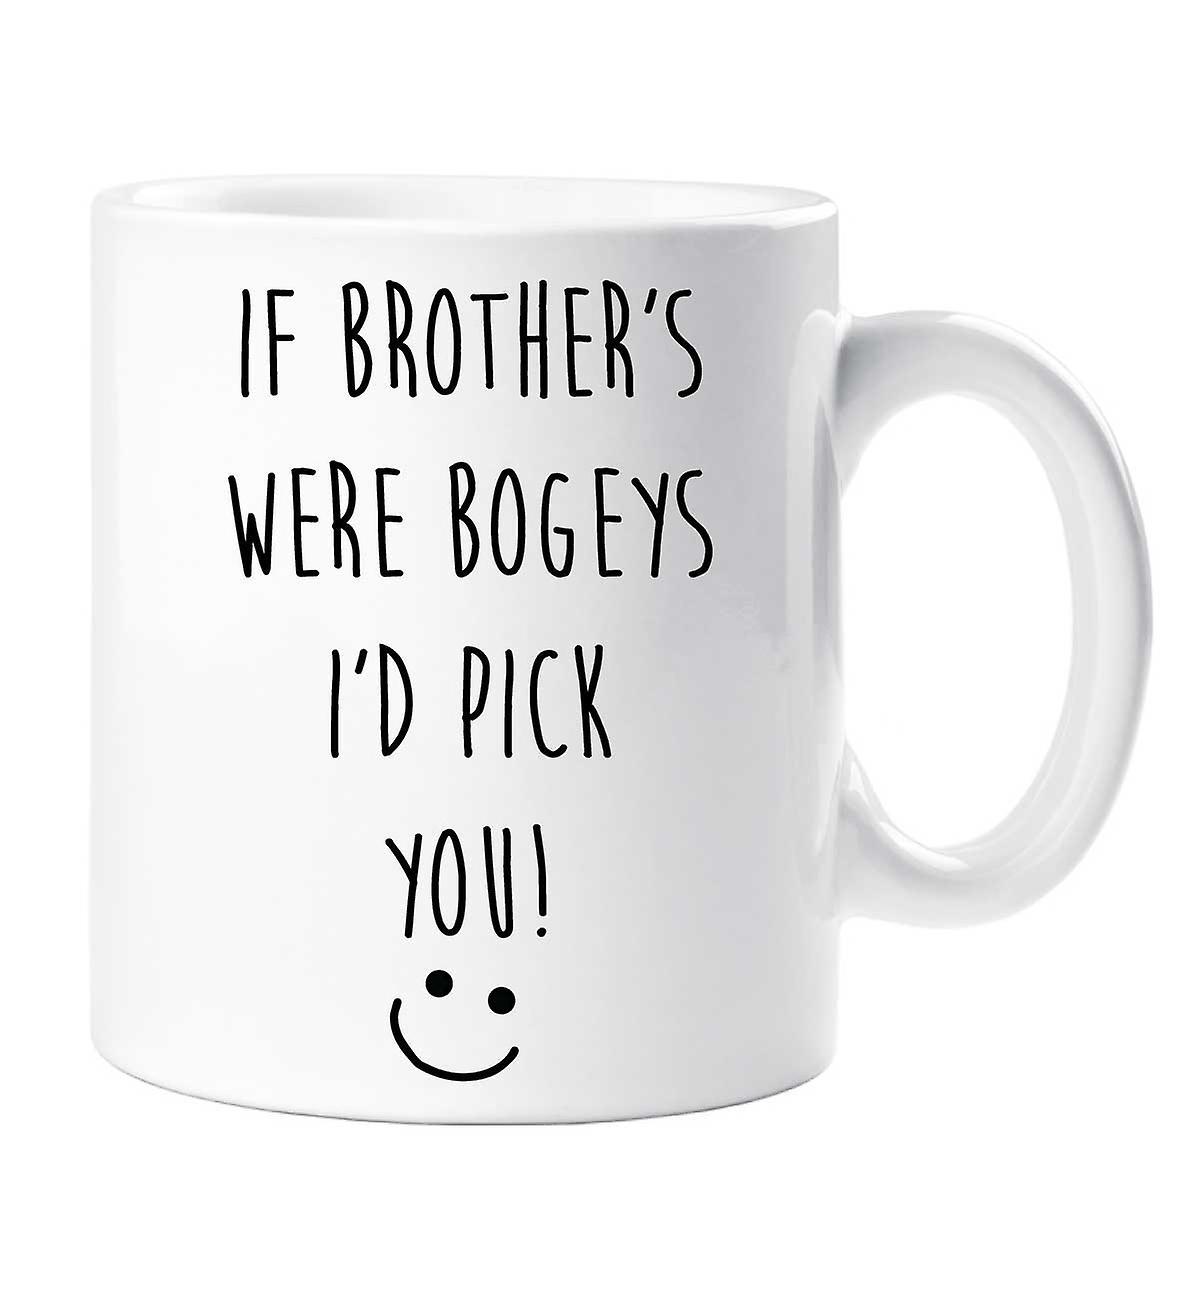 Bogeys Were I'd Brother's Mug If You Pick edCxoB